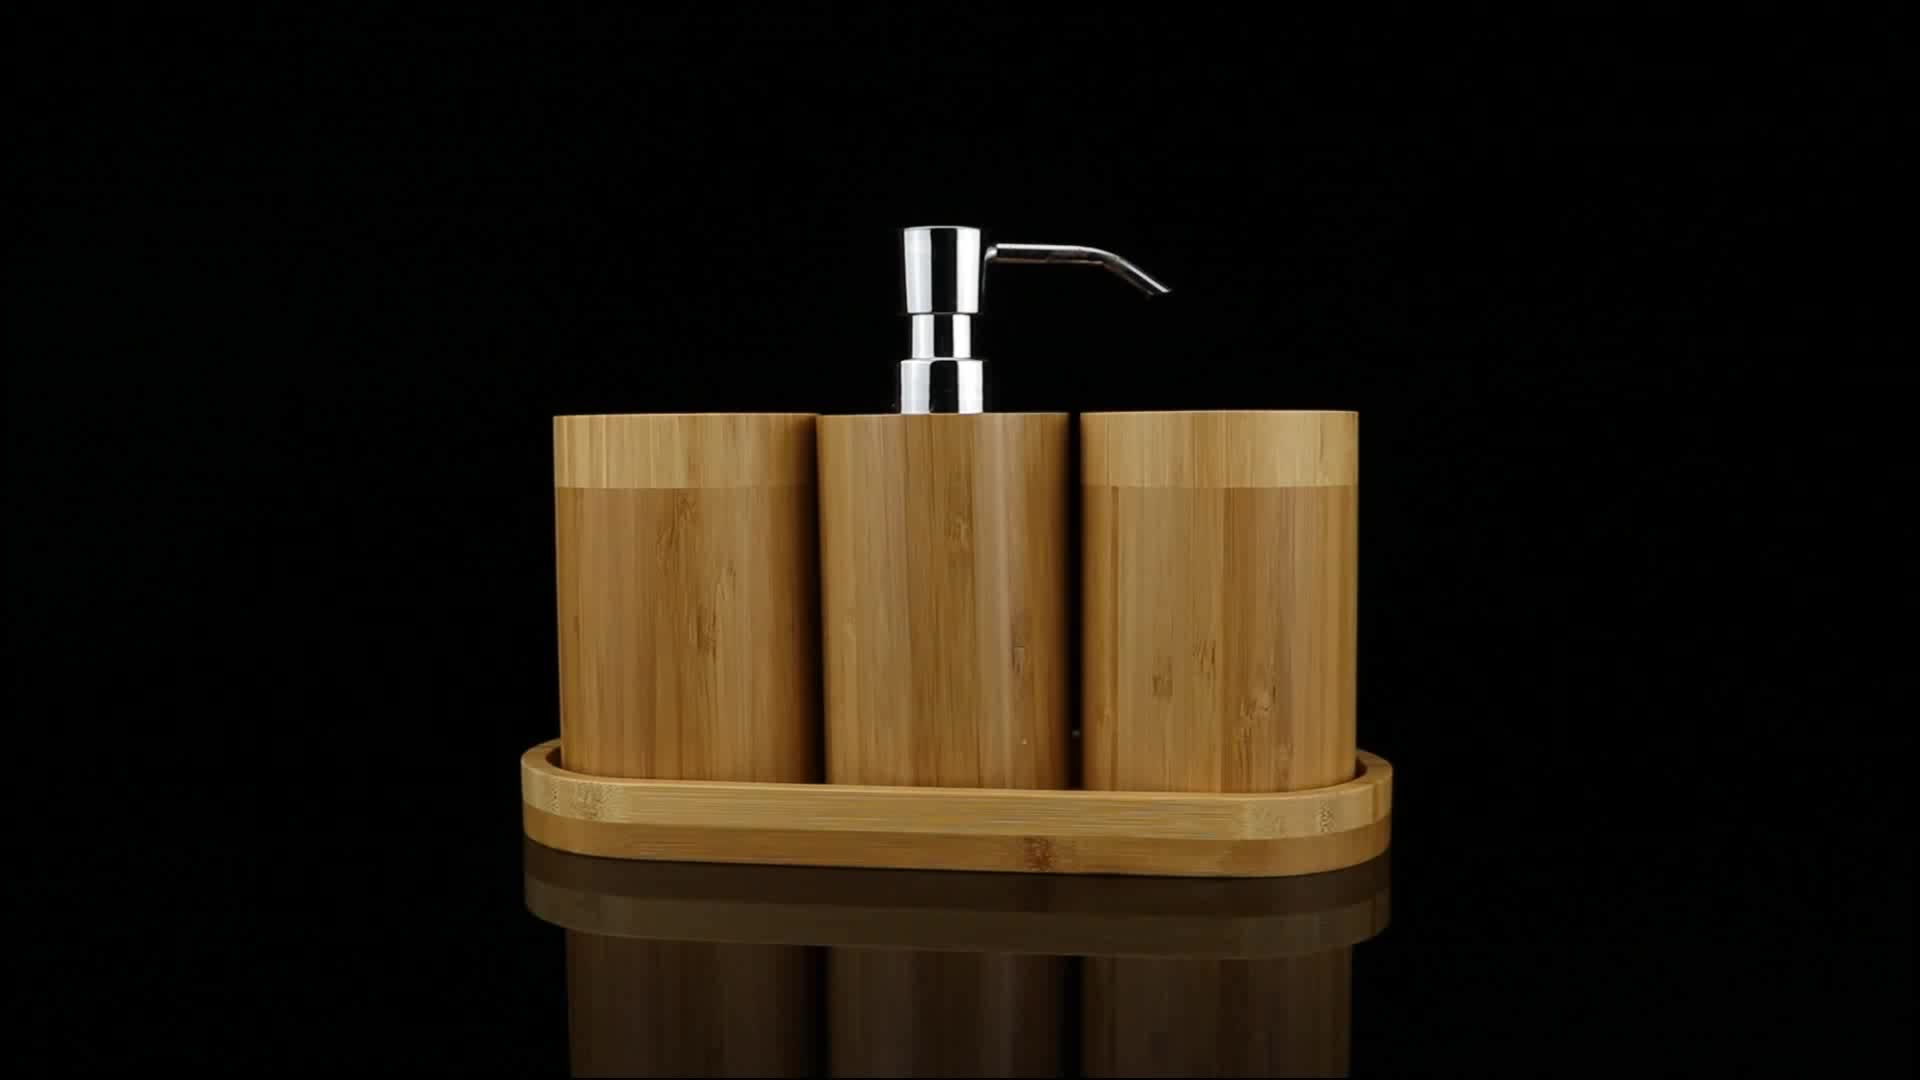 4pcs bamboo or wood bathroom accessory set hotel decor - buy bathroom set bamboo,customize item